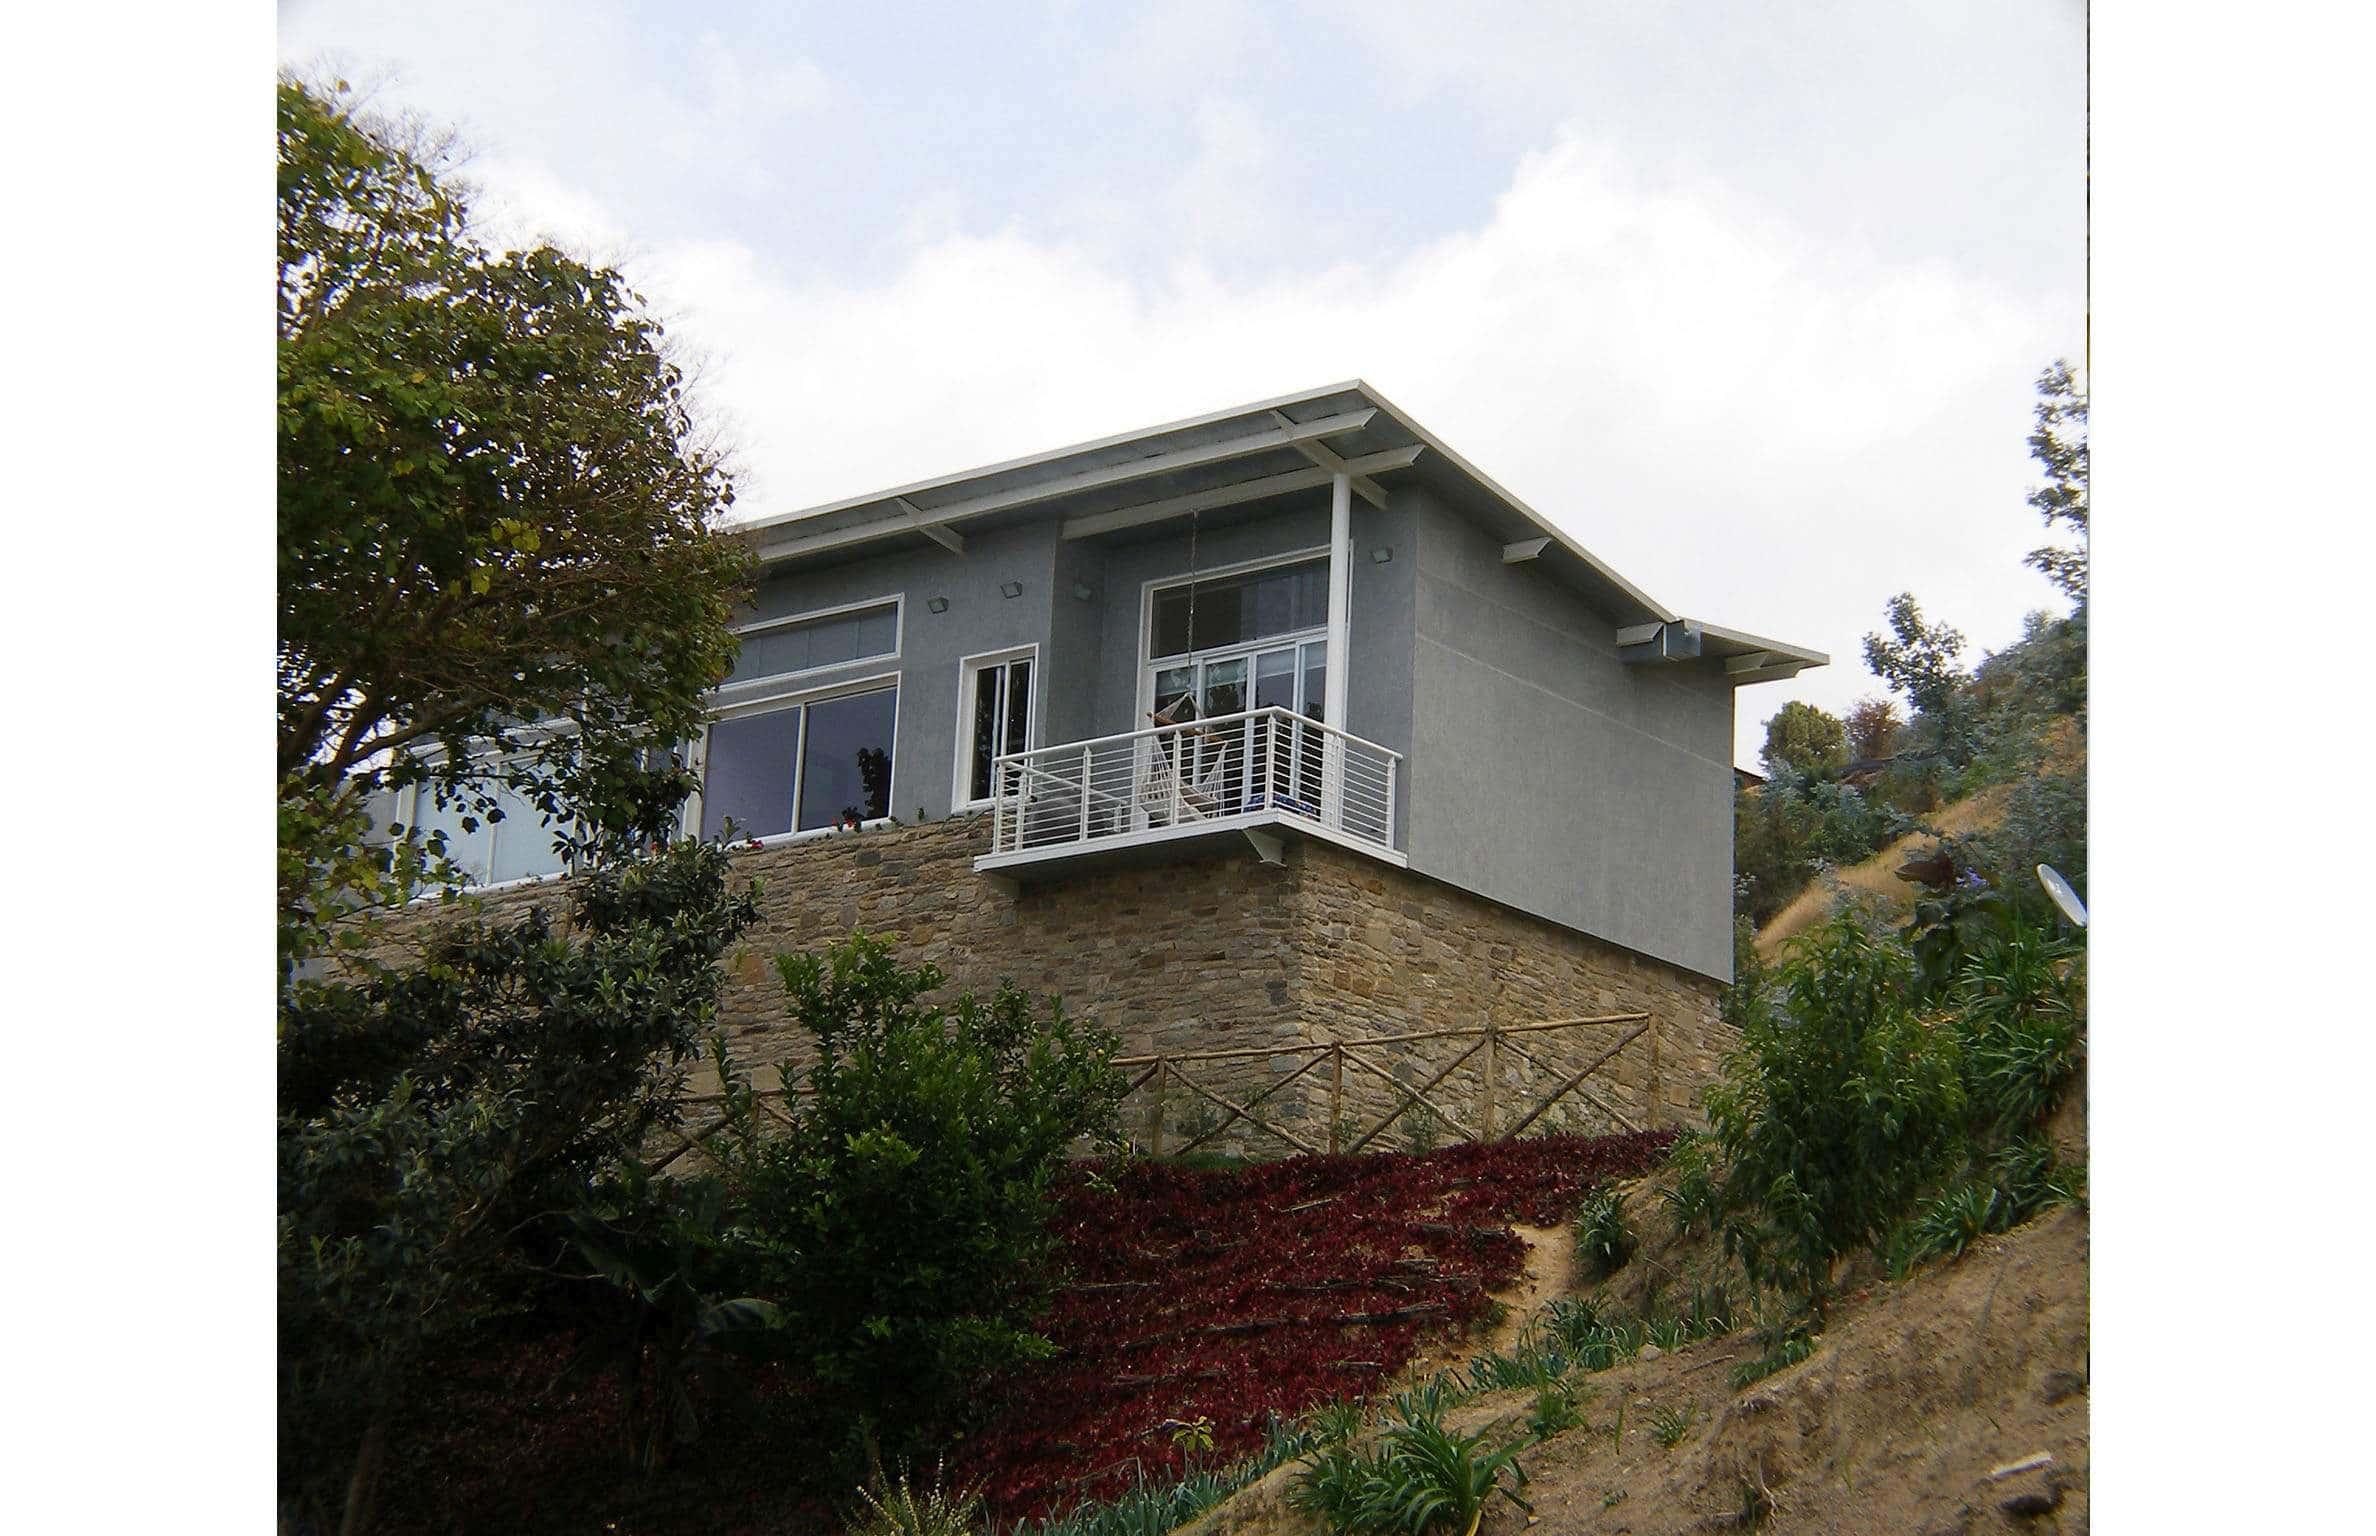 Exterior Architecture front view project in Galipan El Avila, Venezuela